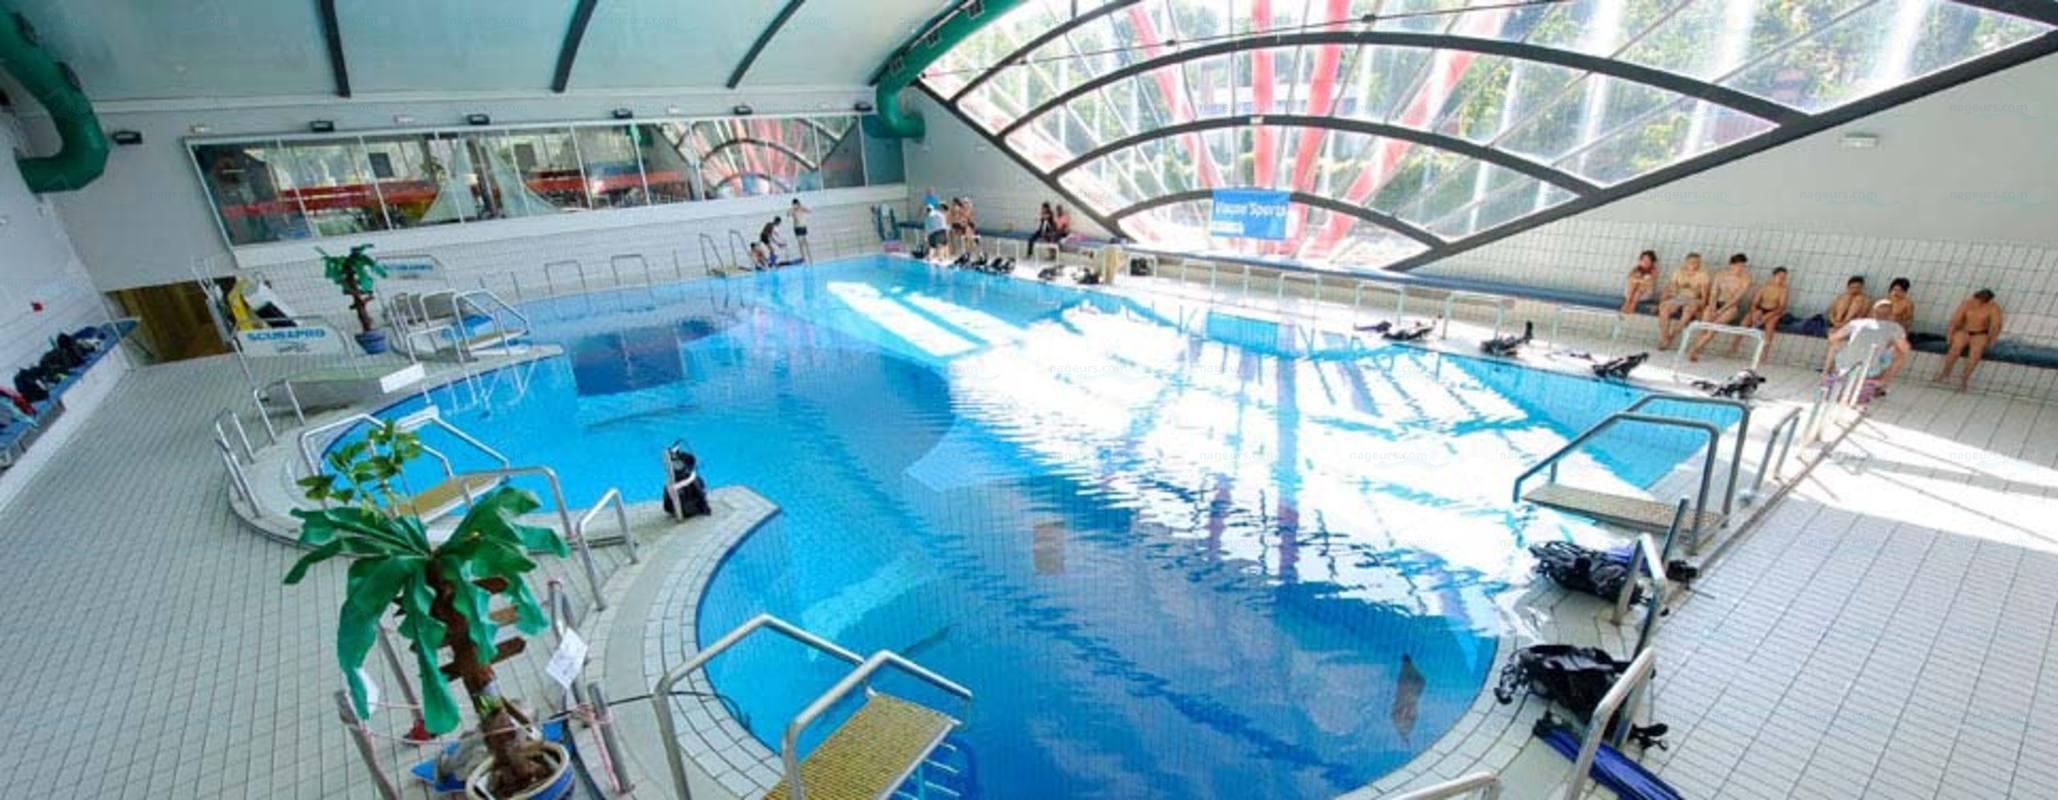 villeneuve la garenne piscine